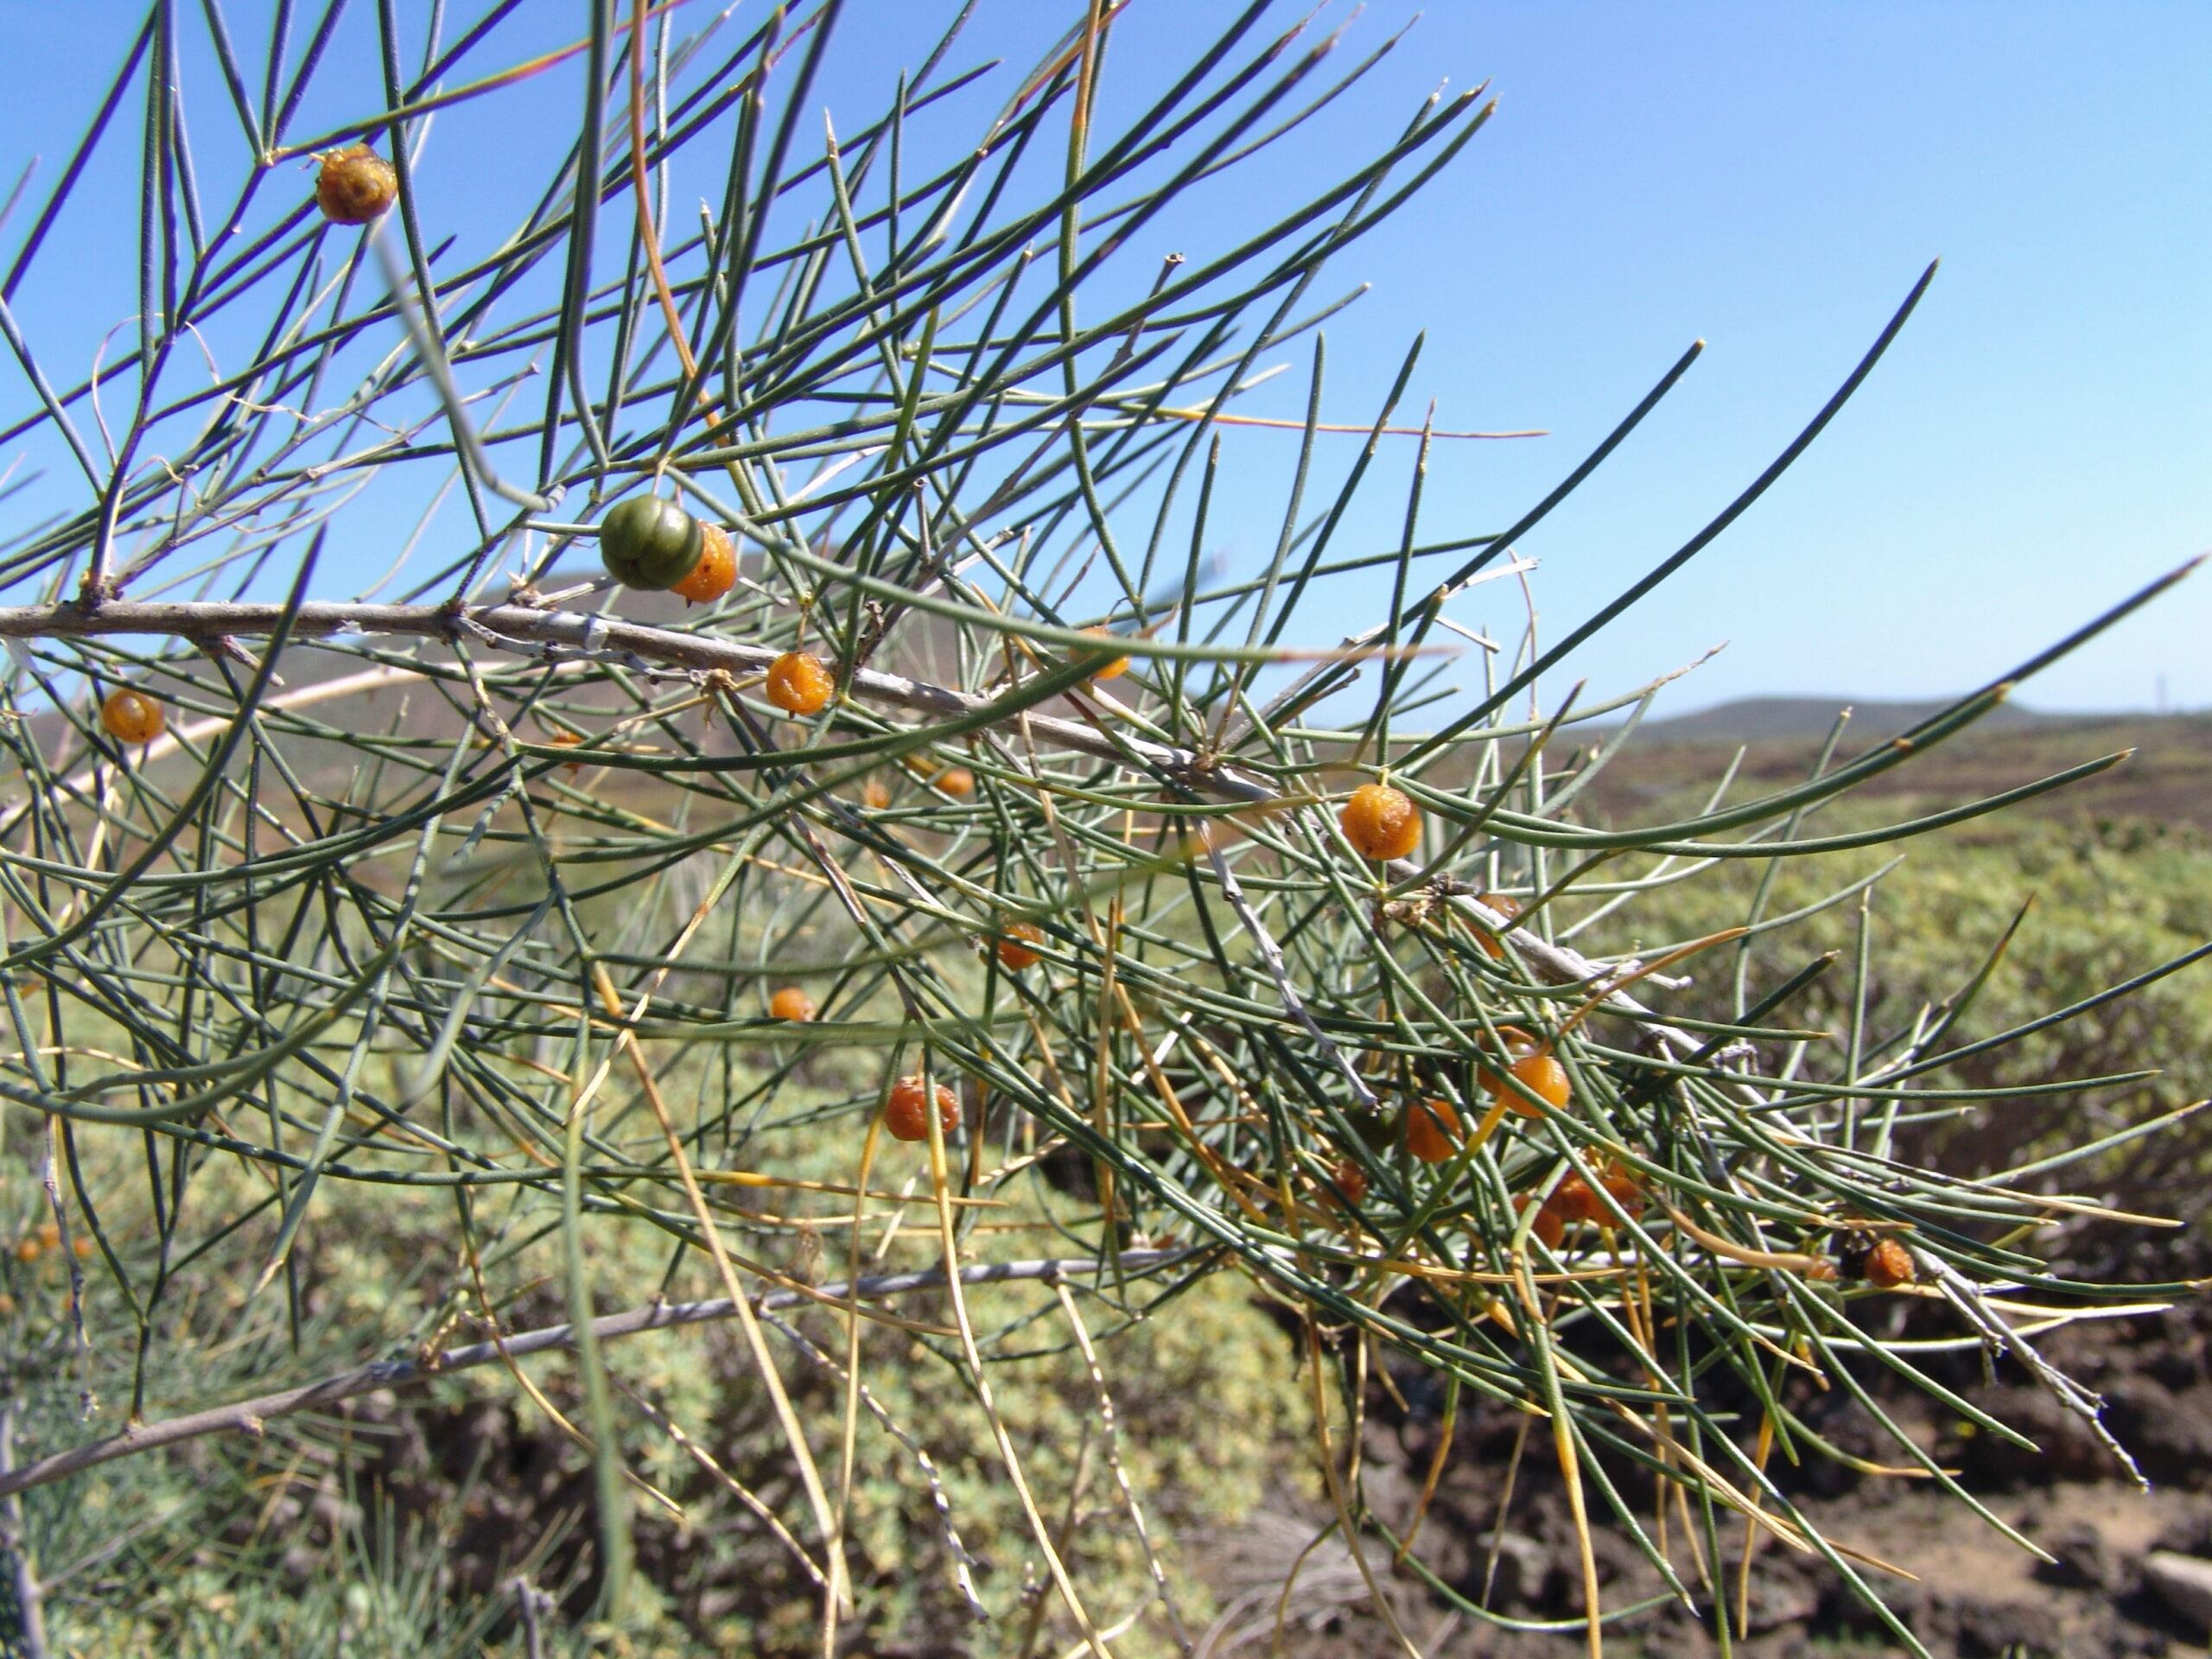 dsc00289-frutos-asparagus-arborescens-la-rasca-2-scaled.jpg